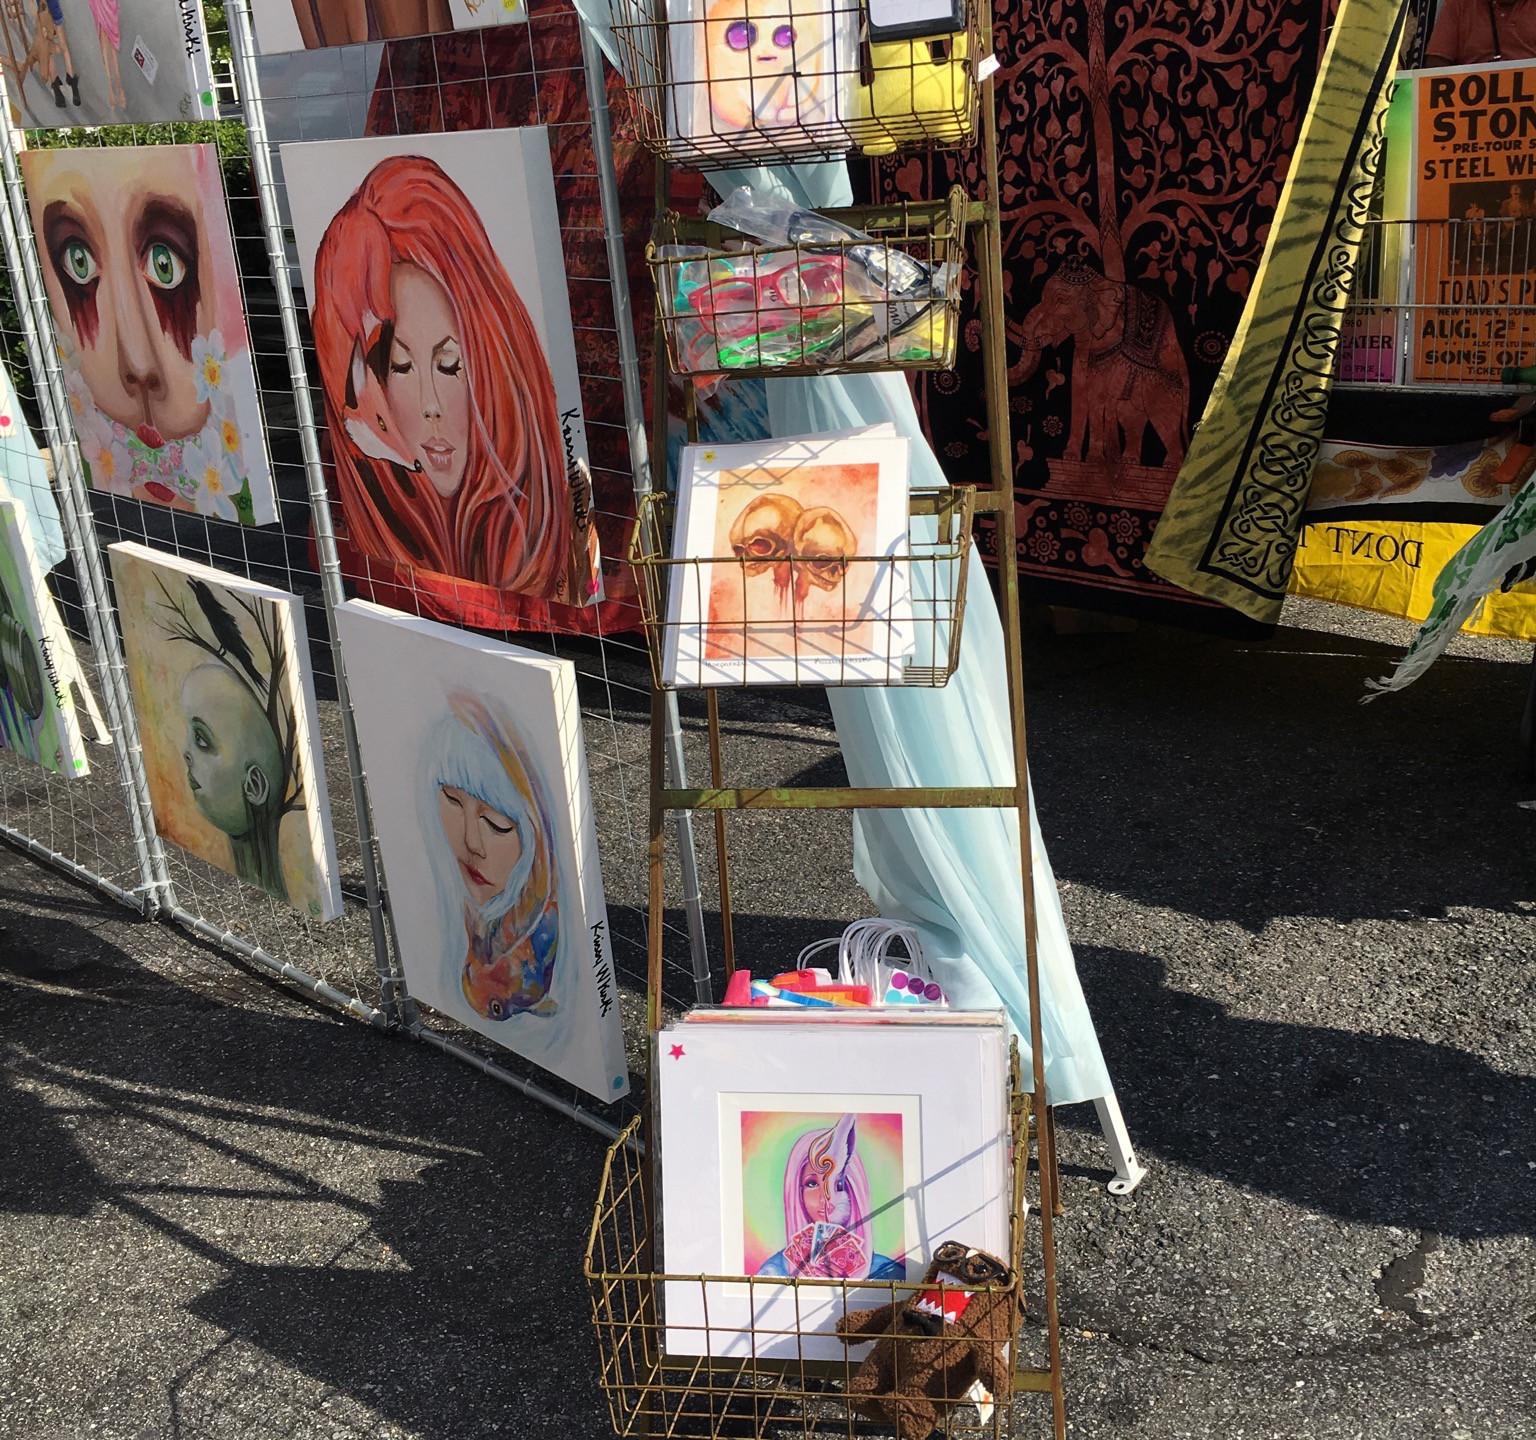 Krissy Whiski Art Show tent craft fair booth how to prepare for a trade show craft art fair